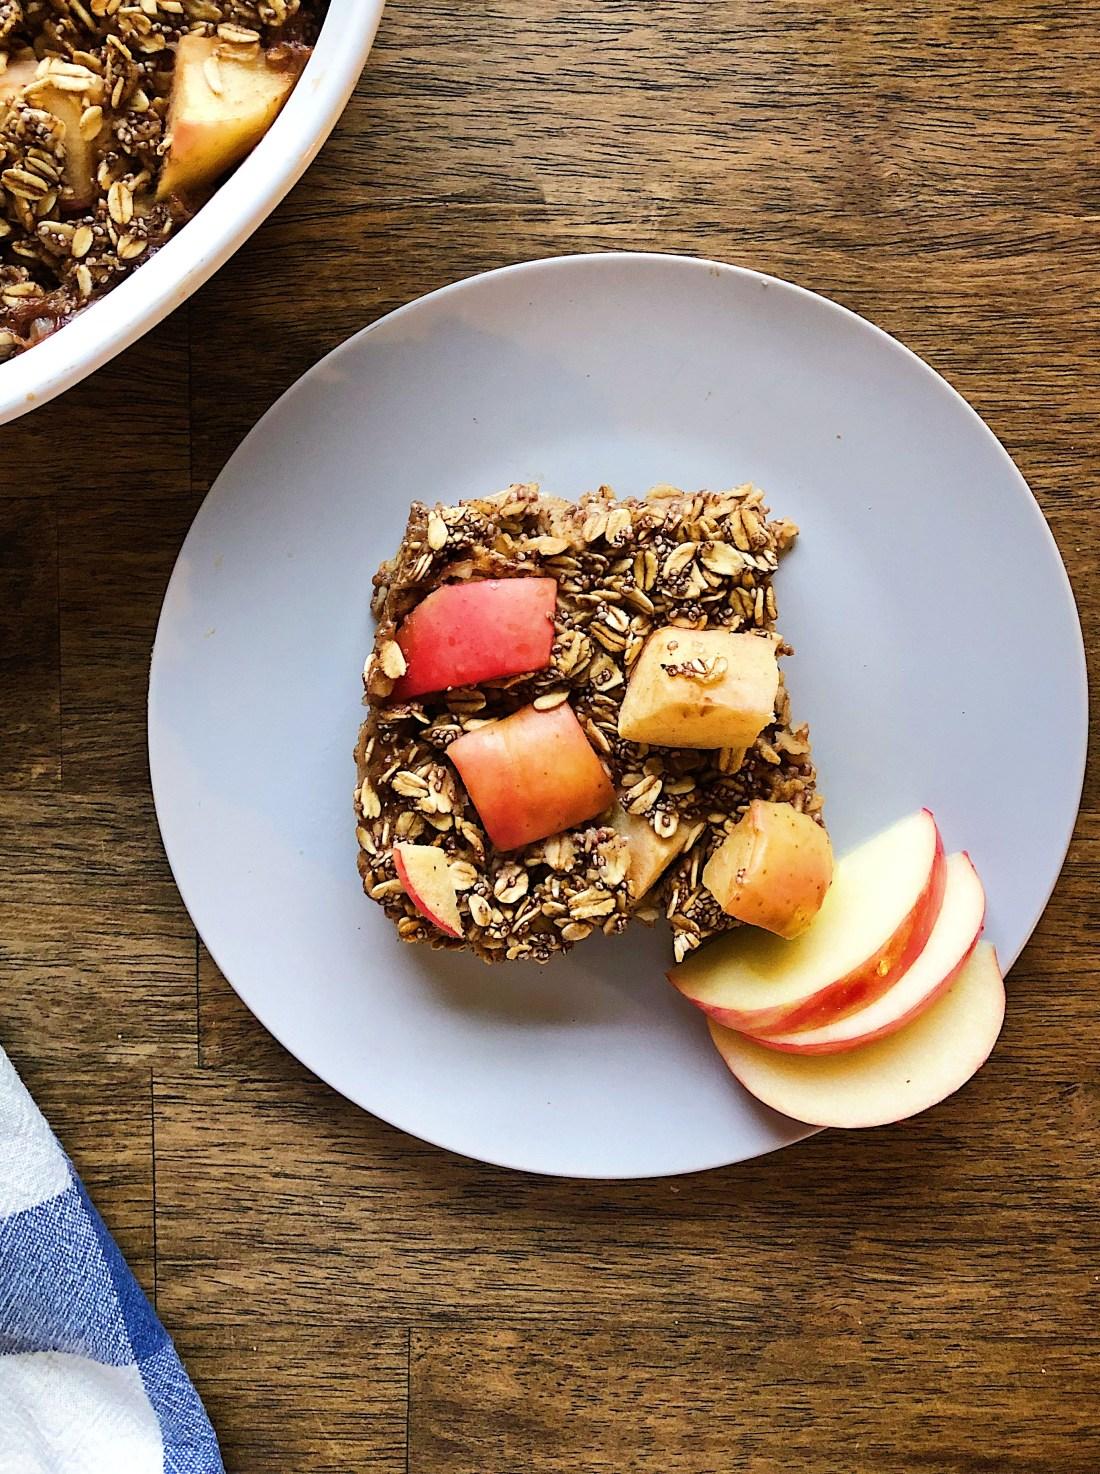 Vegan Apple Cinnamon Baked Oatmeal